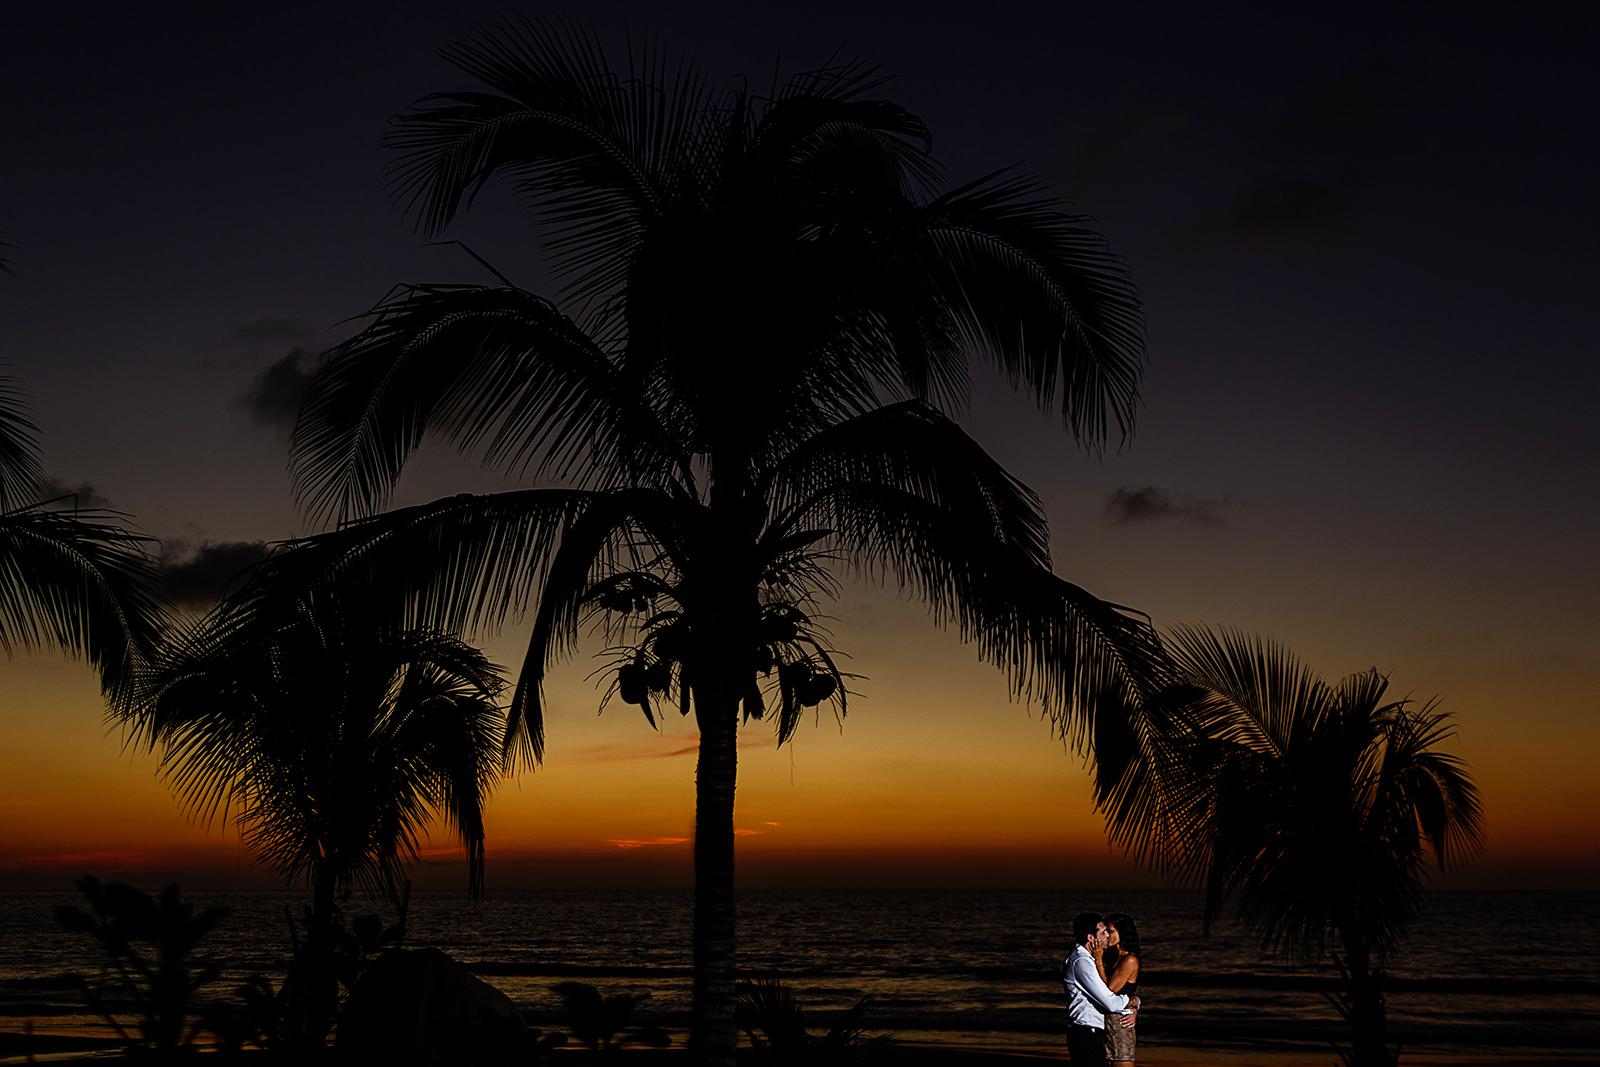 Couple kissing under dramatic sunset at Imanta Resort - Punta de Mita, Mexico